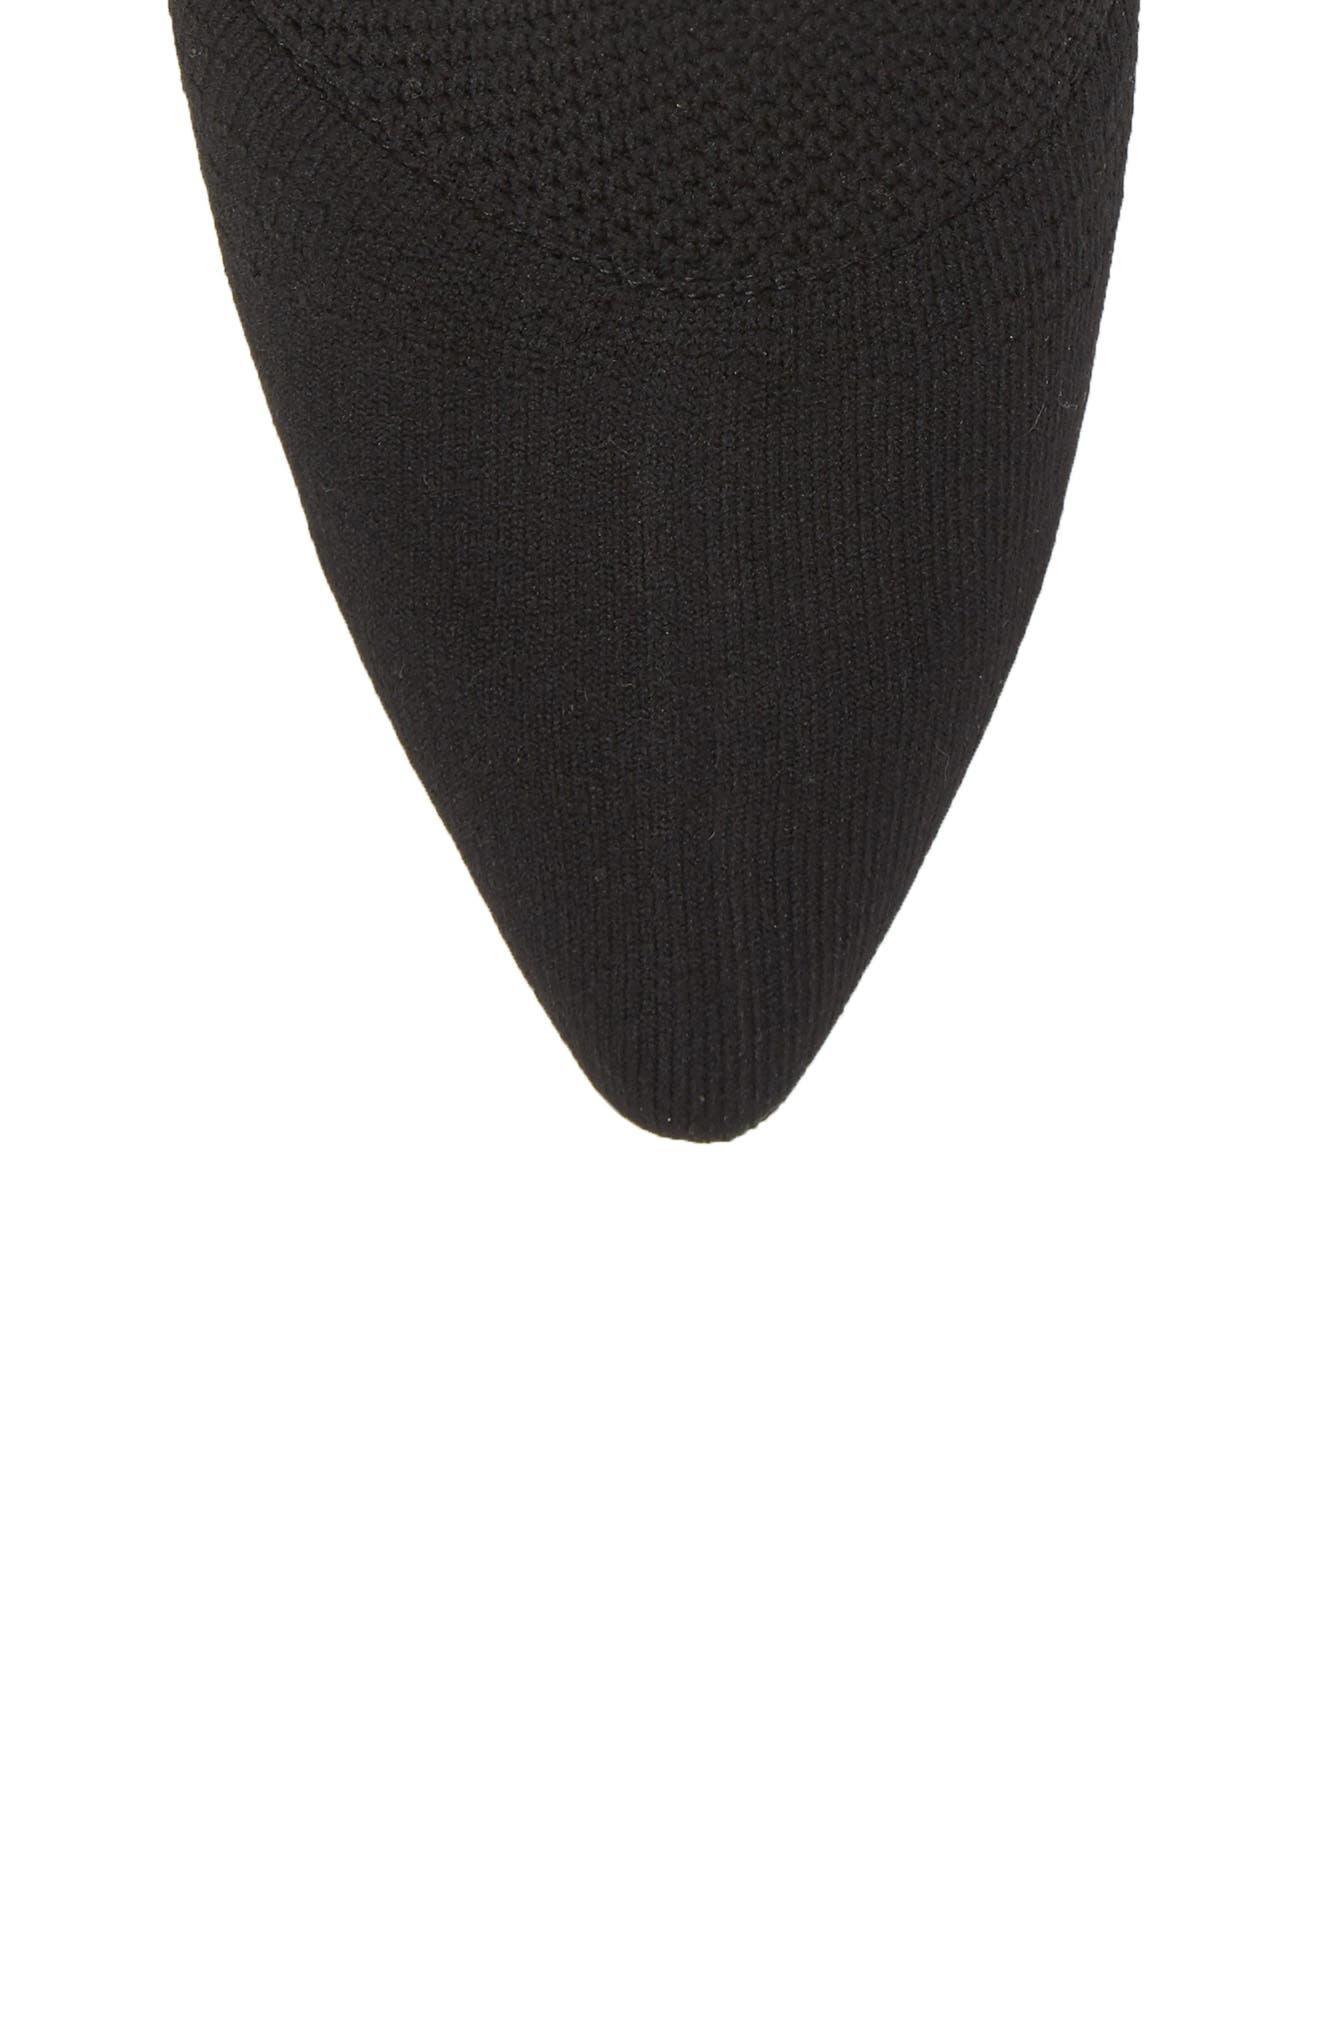 Acadia 2 Sock Bootie,                             Alternate thumbnail 5, color,                             BLACK WOVEN